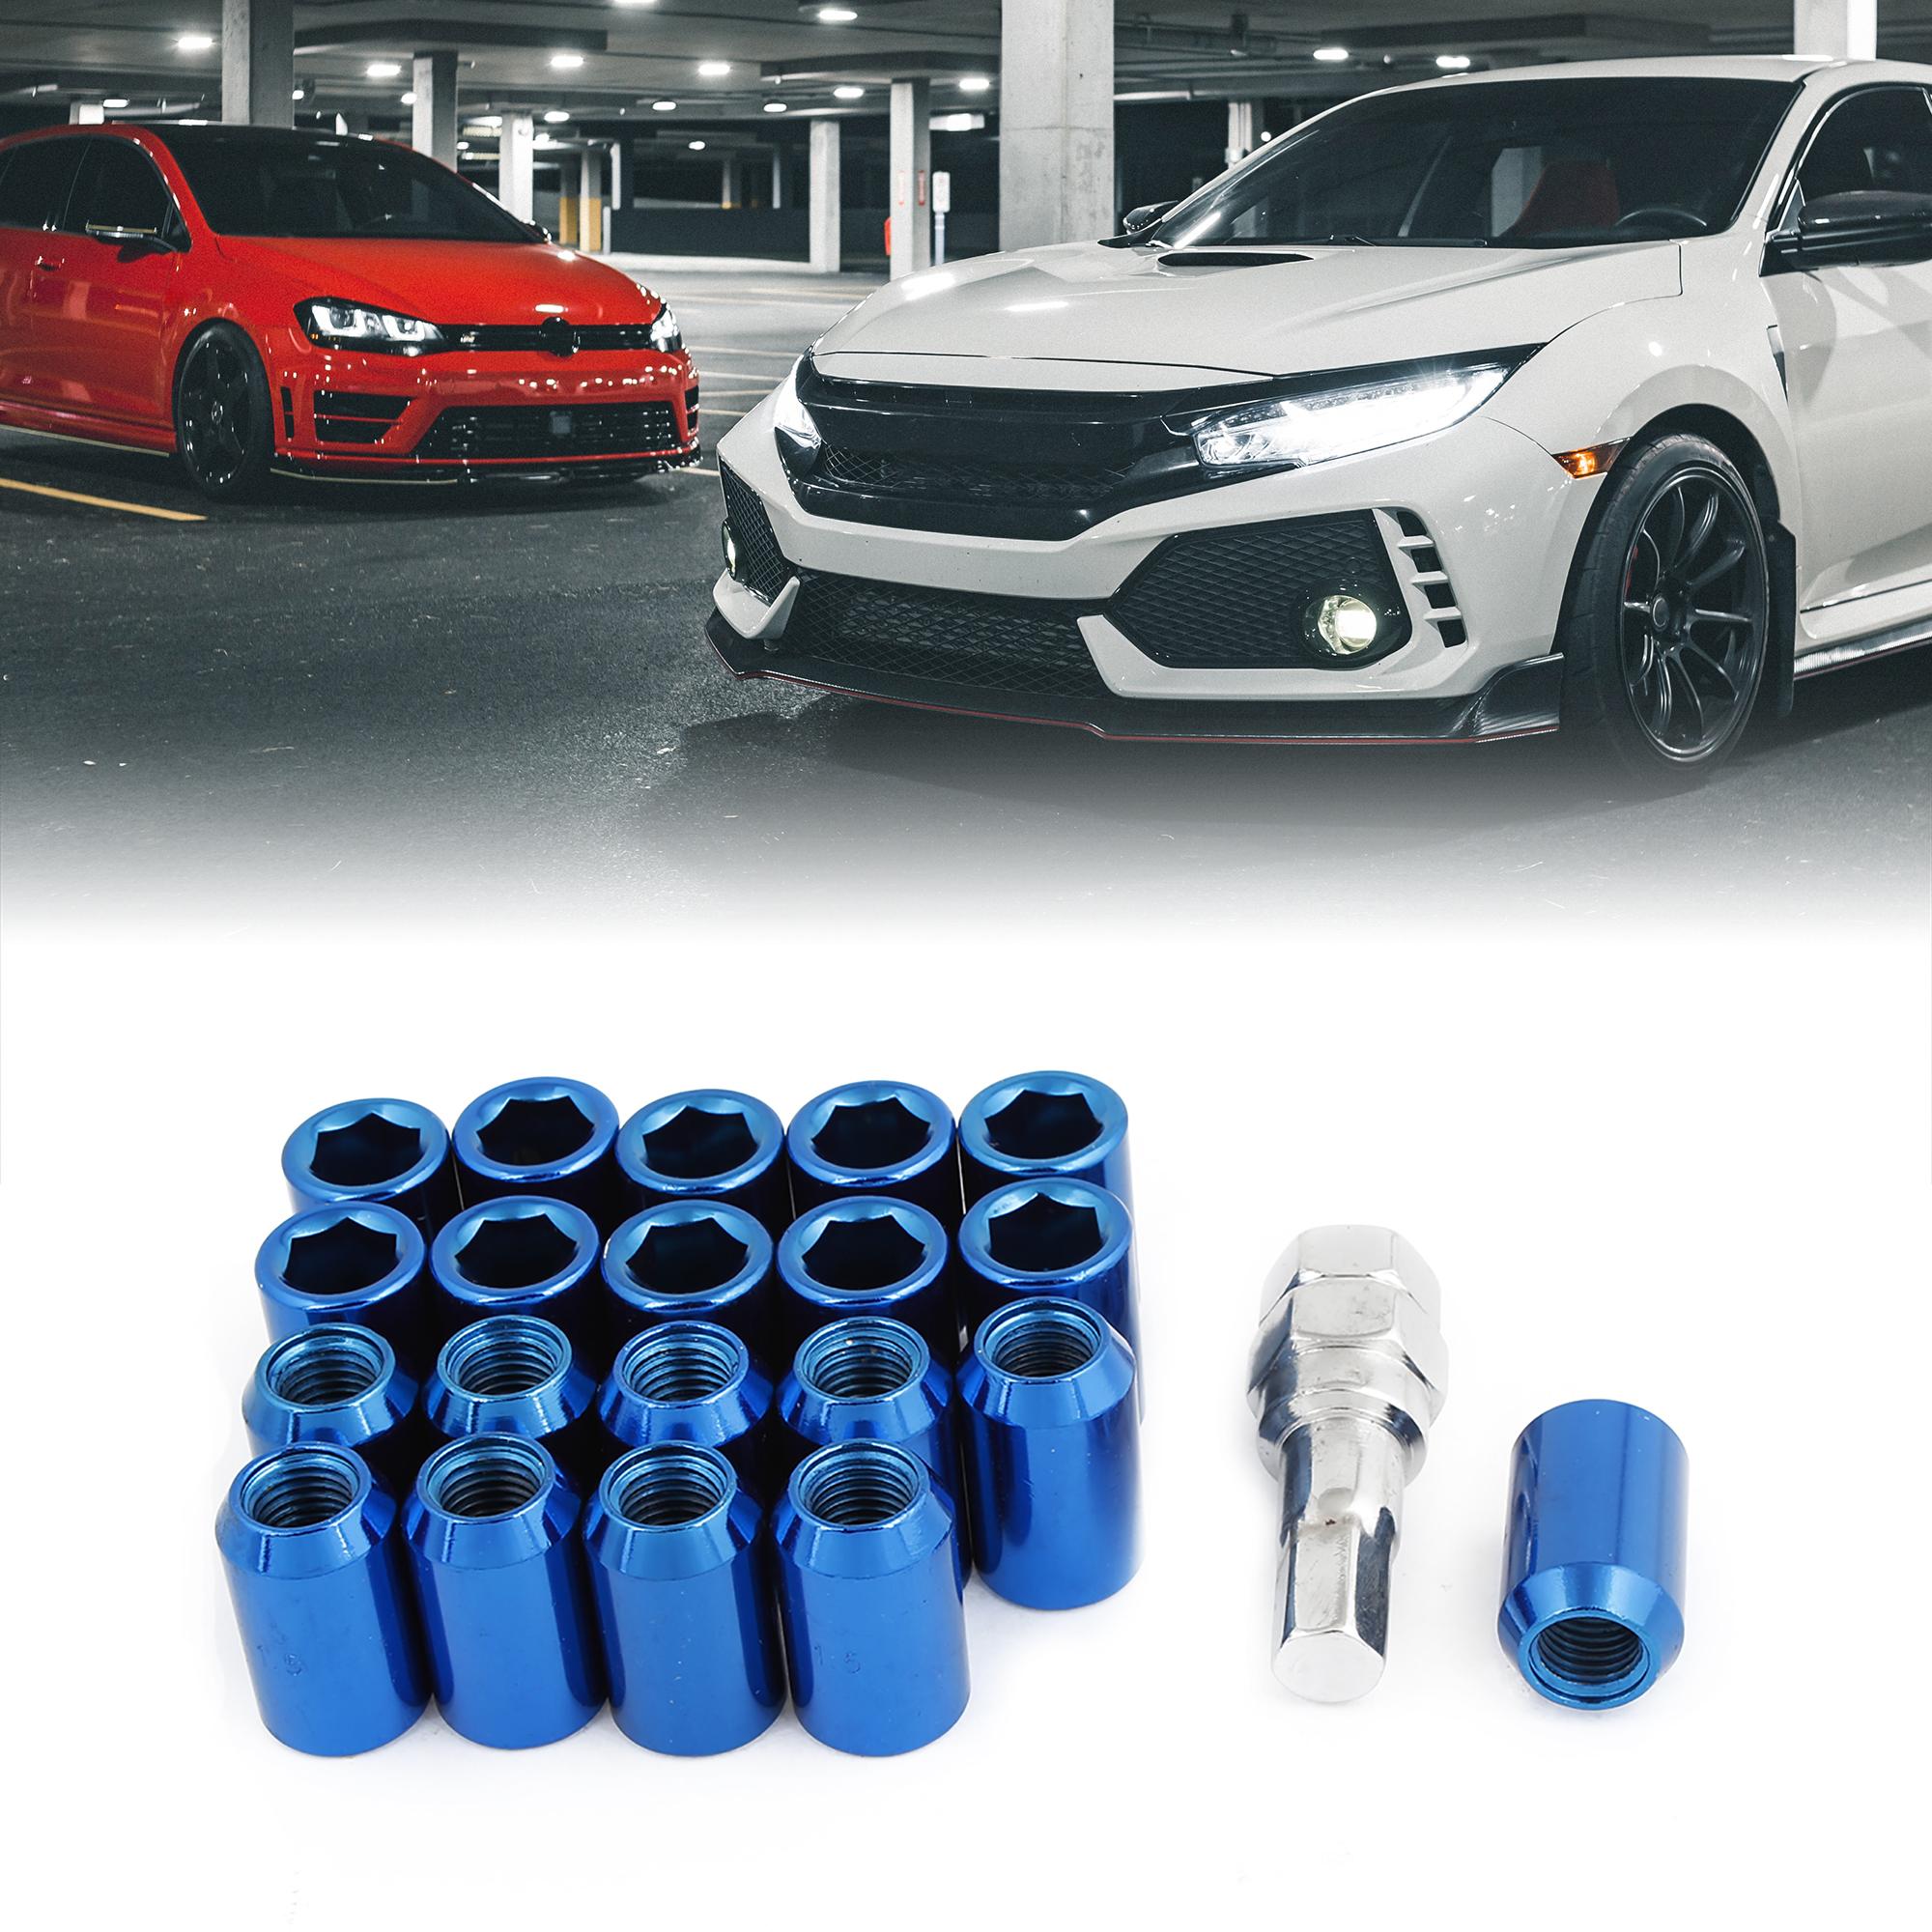 21 Pcs Car Blue Metal 12mmx1.5 Wheel Lock Tyre Tuner Lug Nut Set